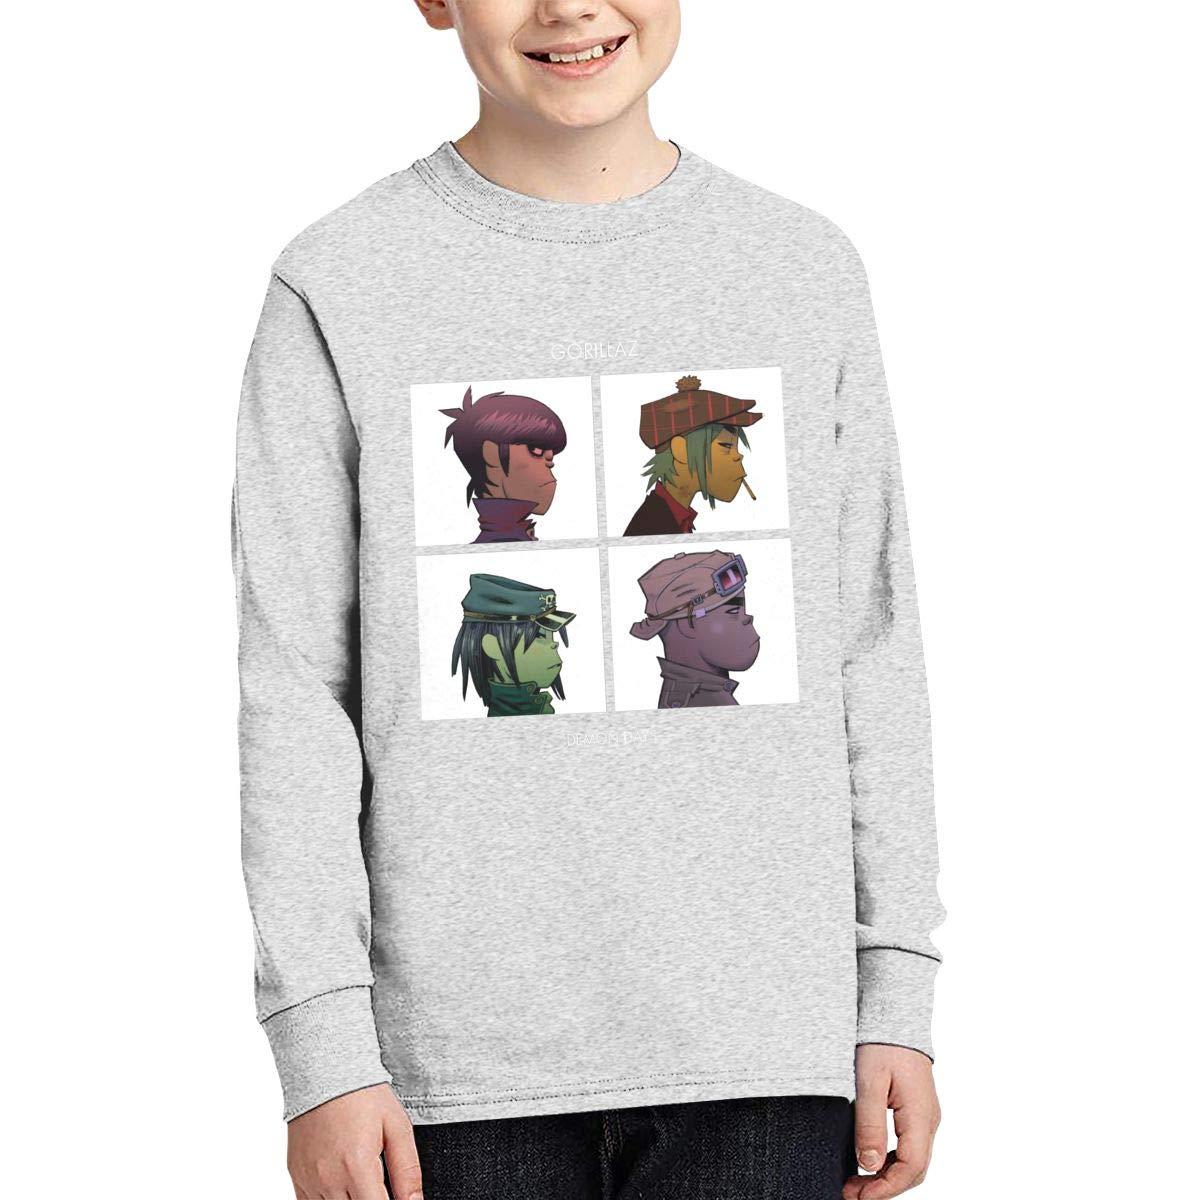 S-XL QIMING SHIPPING Gra-vity-Falls-Mabel Pines Teenage T-Shirt,Boys T-Shirts,Girls T-Shirts,Size